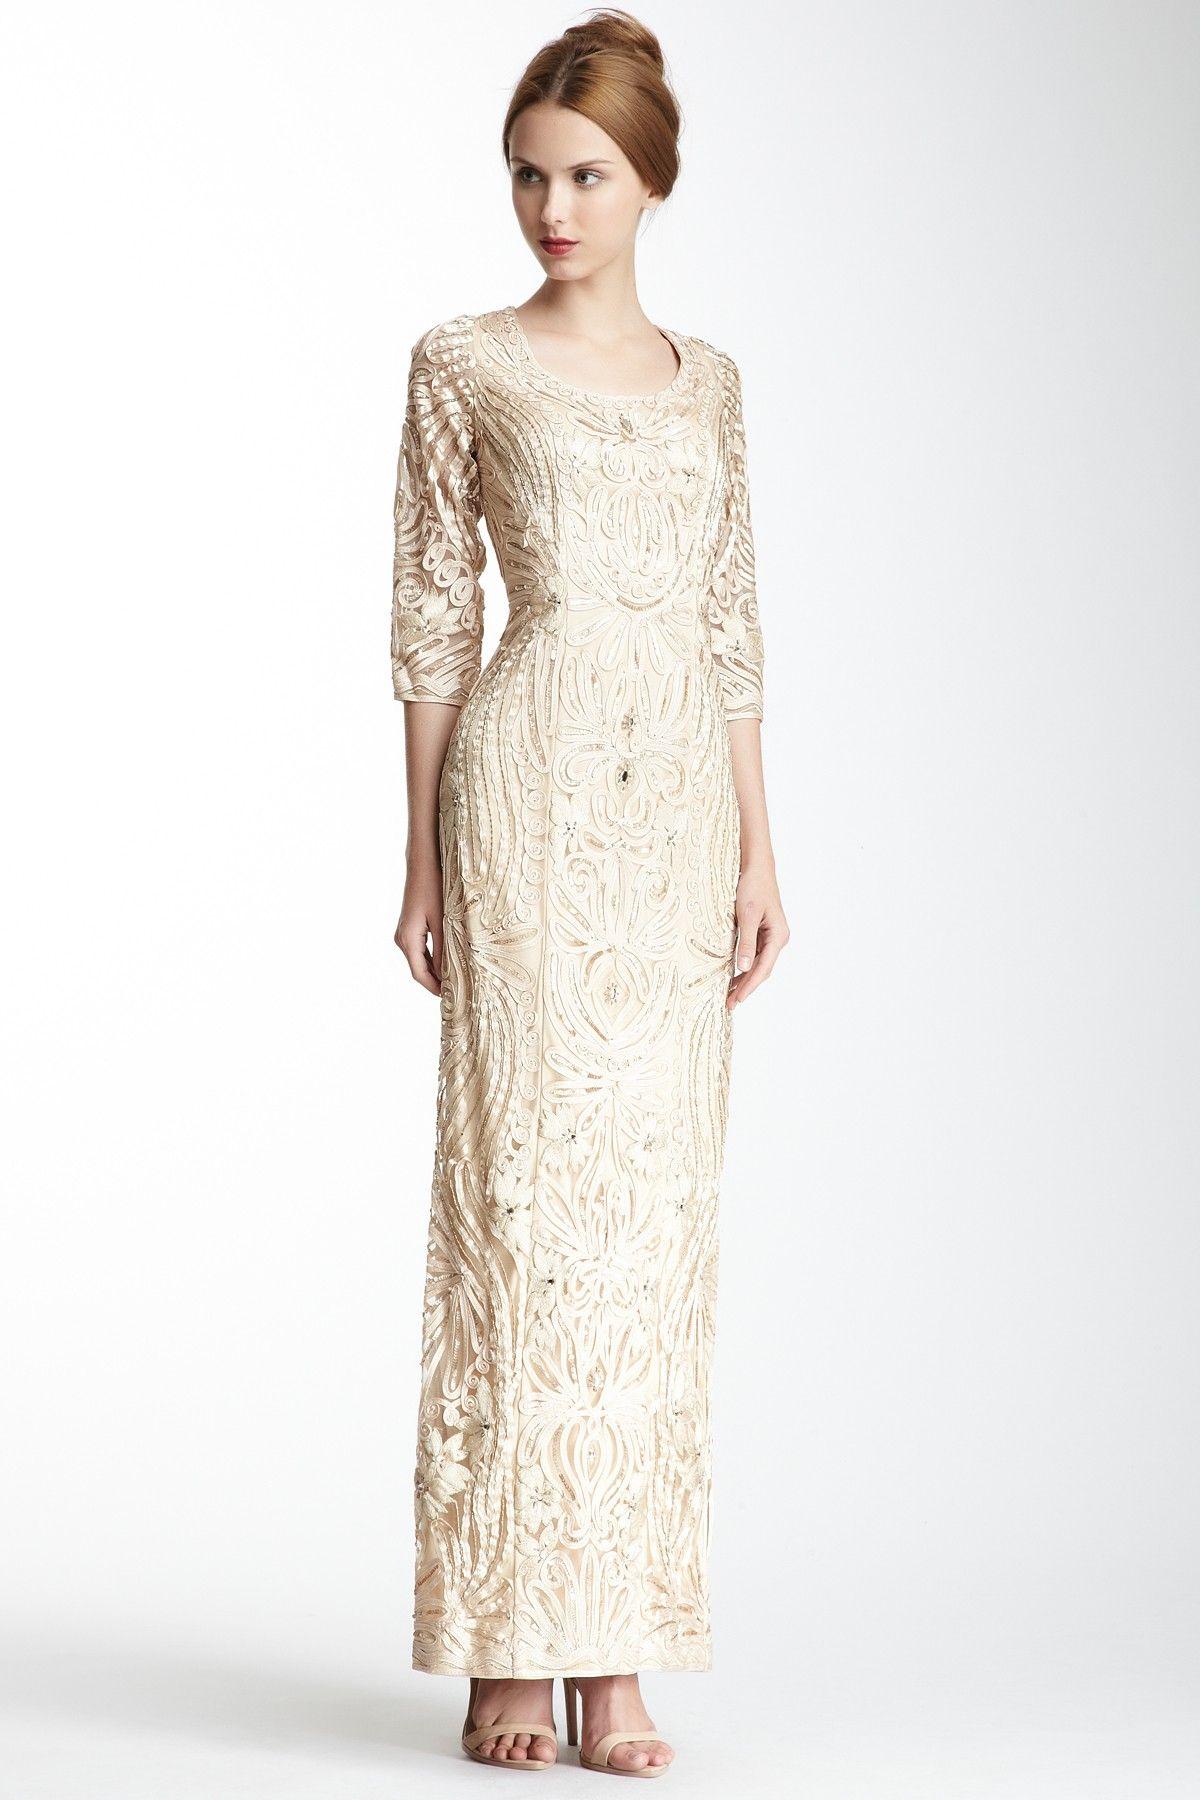 Sue Wong 3/4 Length Sleeve Embroidered Dress// Wedding